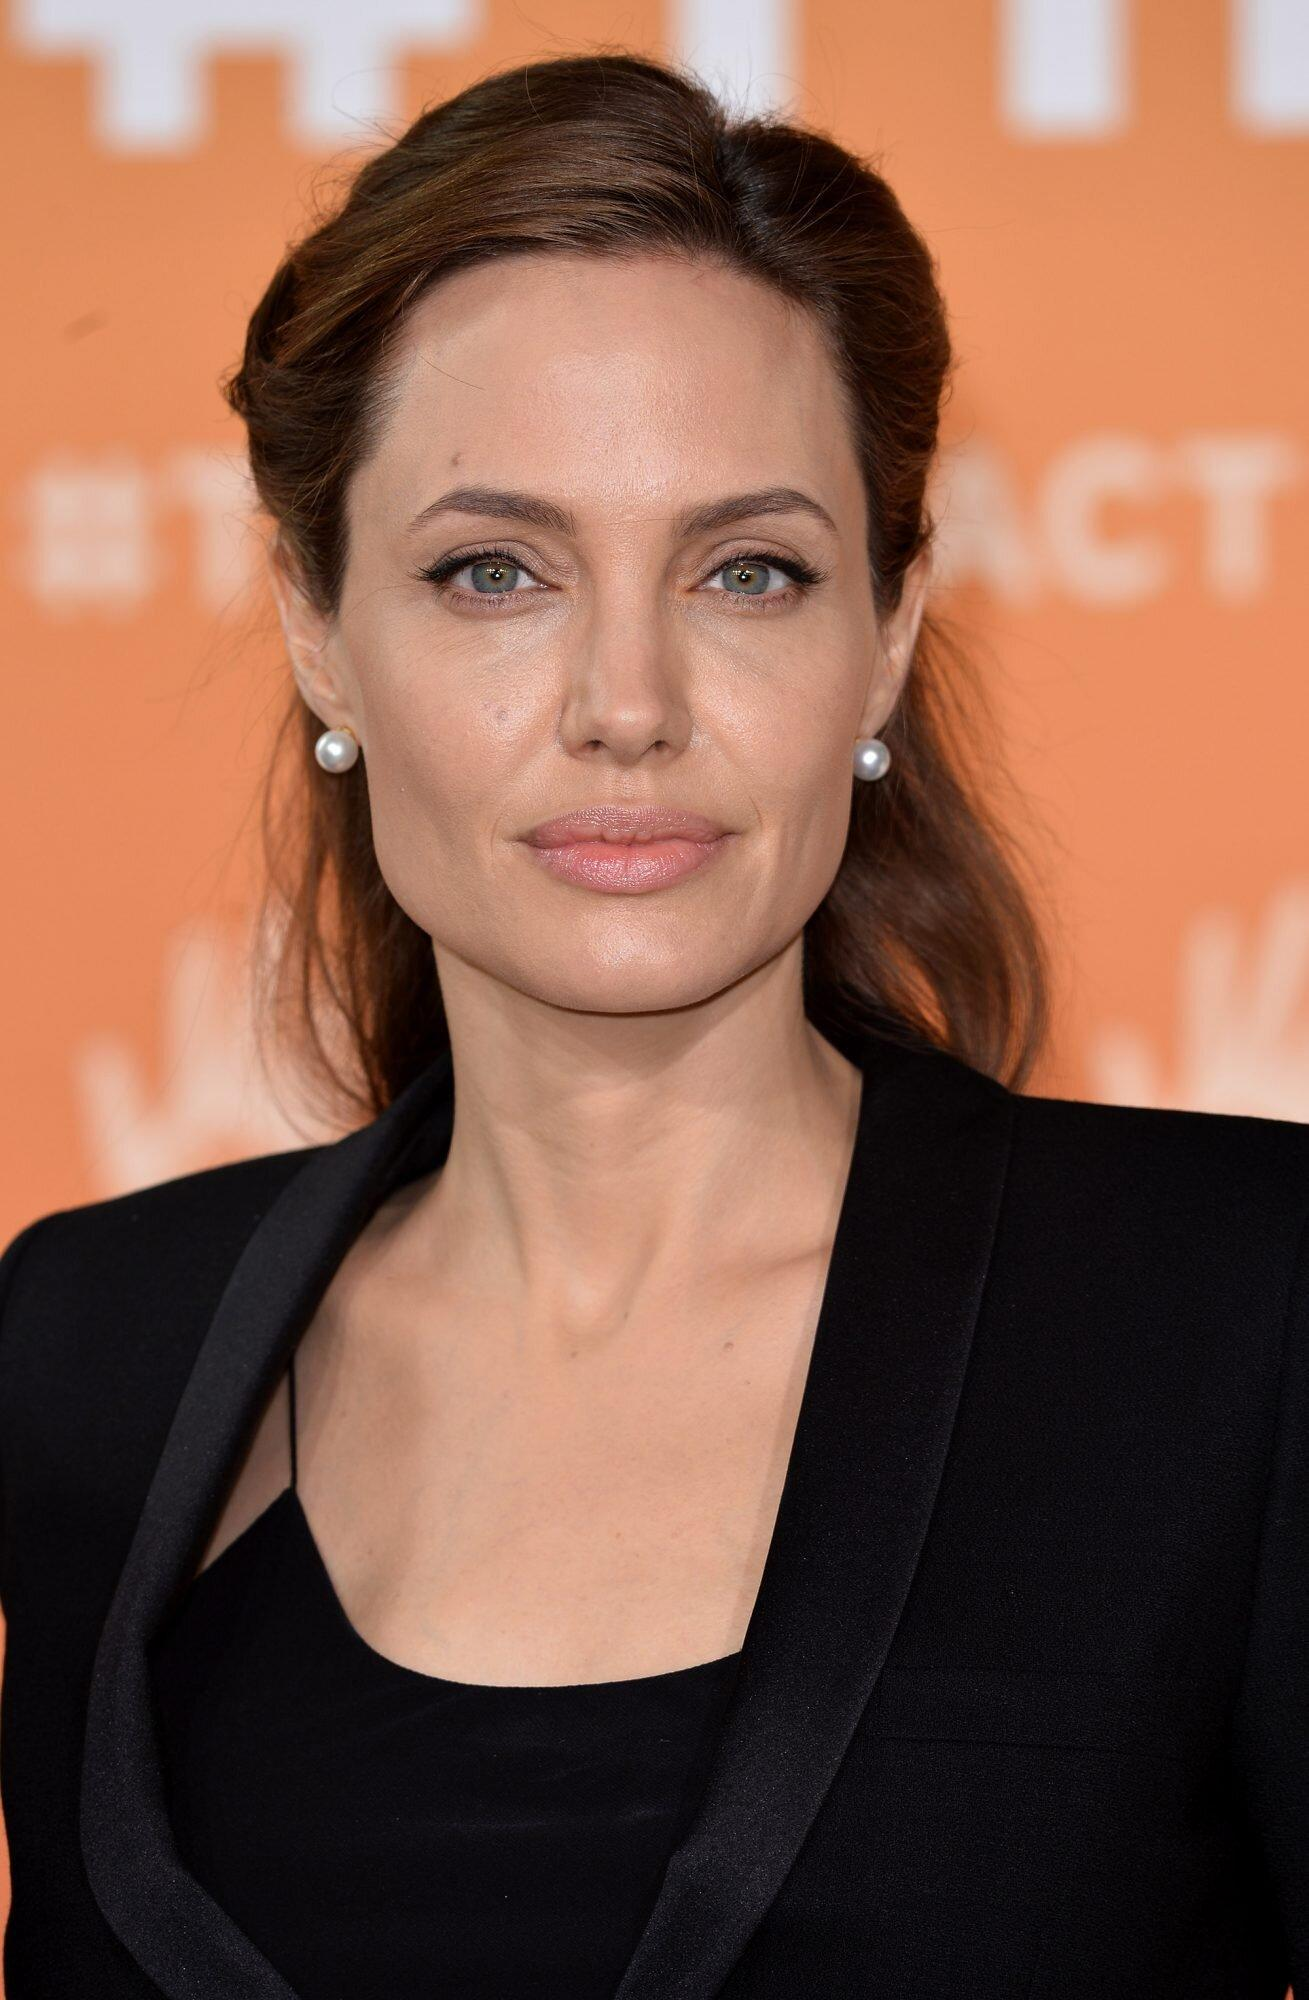 Angelina Jolie Makes Extremely Generous Donation To Boys Lemonade Stand Raising Funds For Yemen